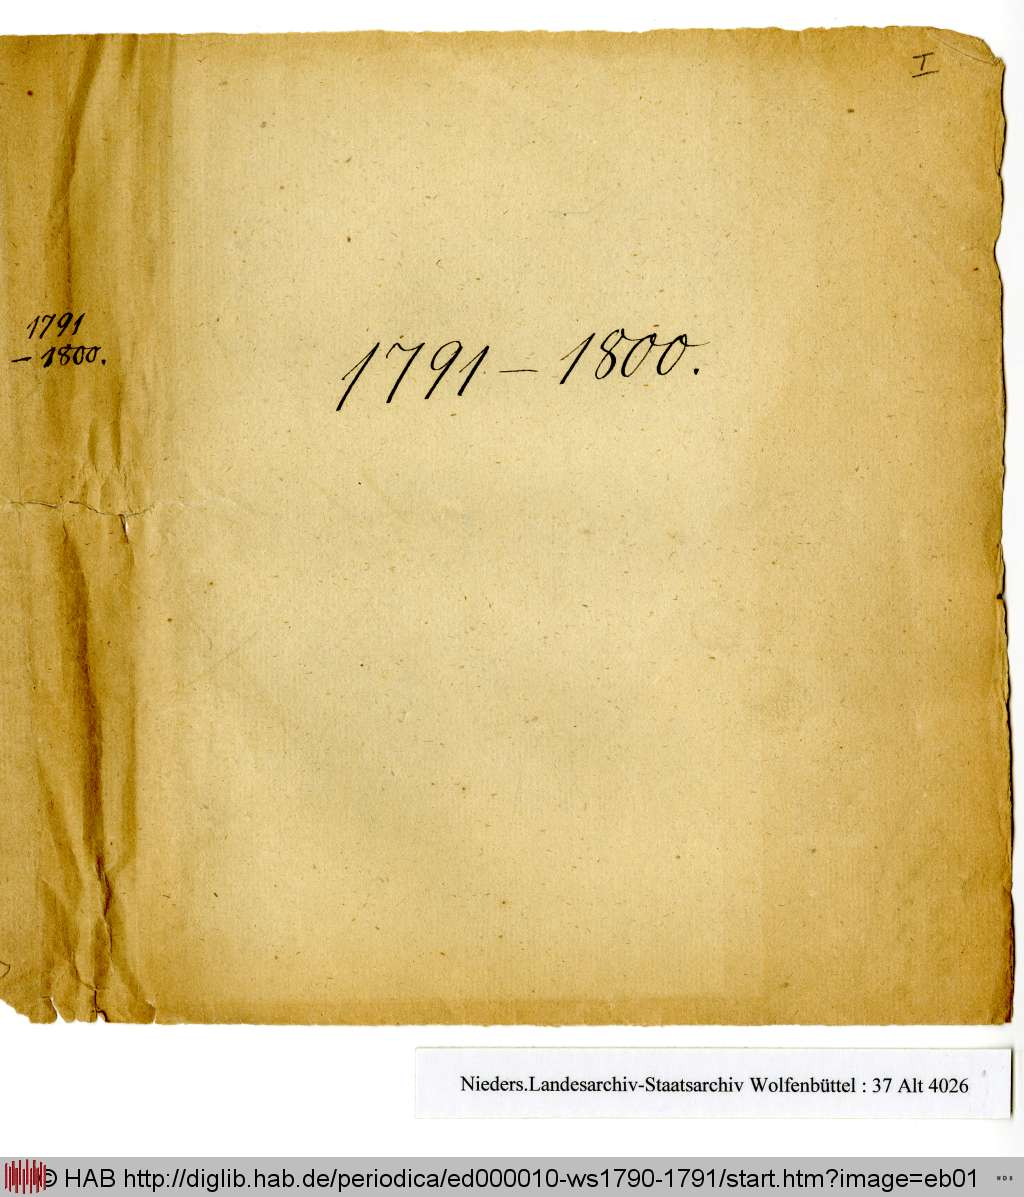 http://diglib.hab.de/periodica/ed000010-ws1790-1791/eb01.jpg